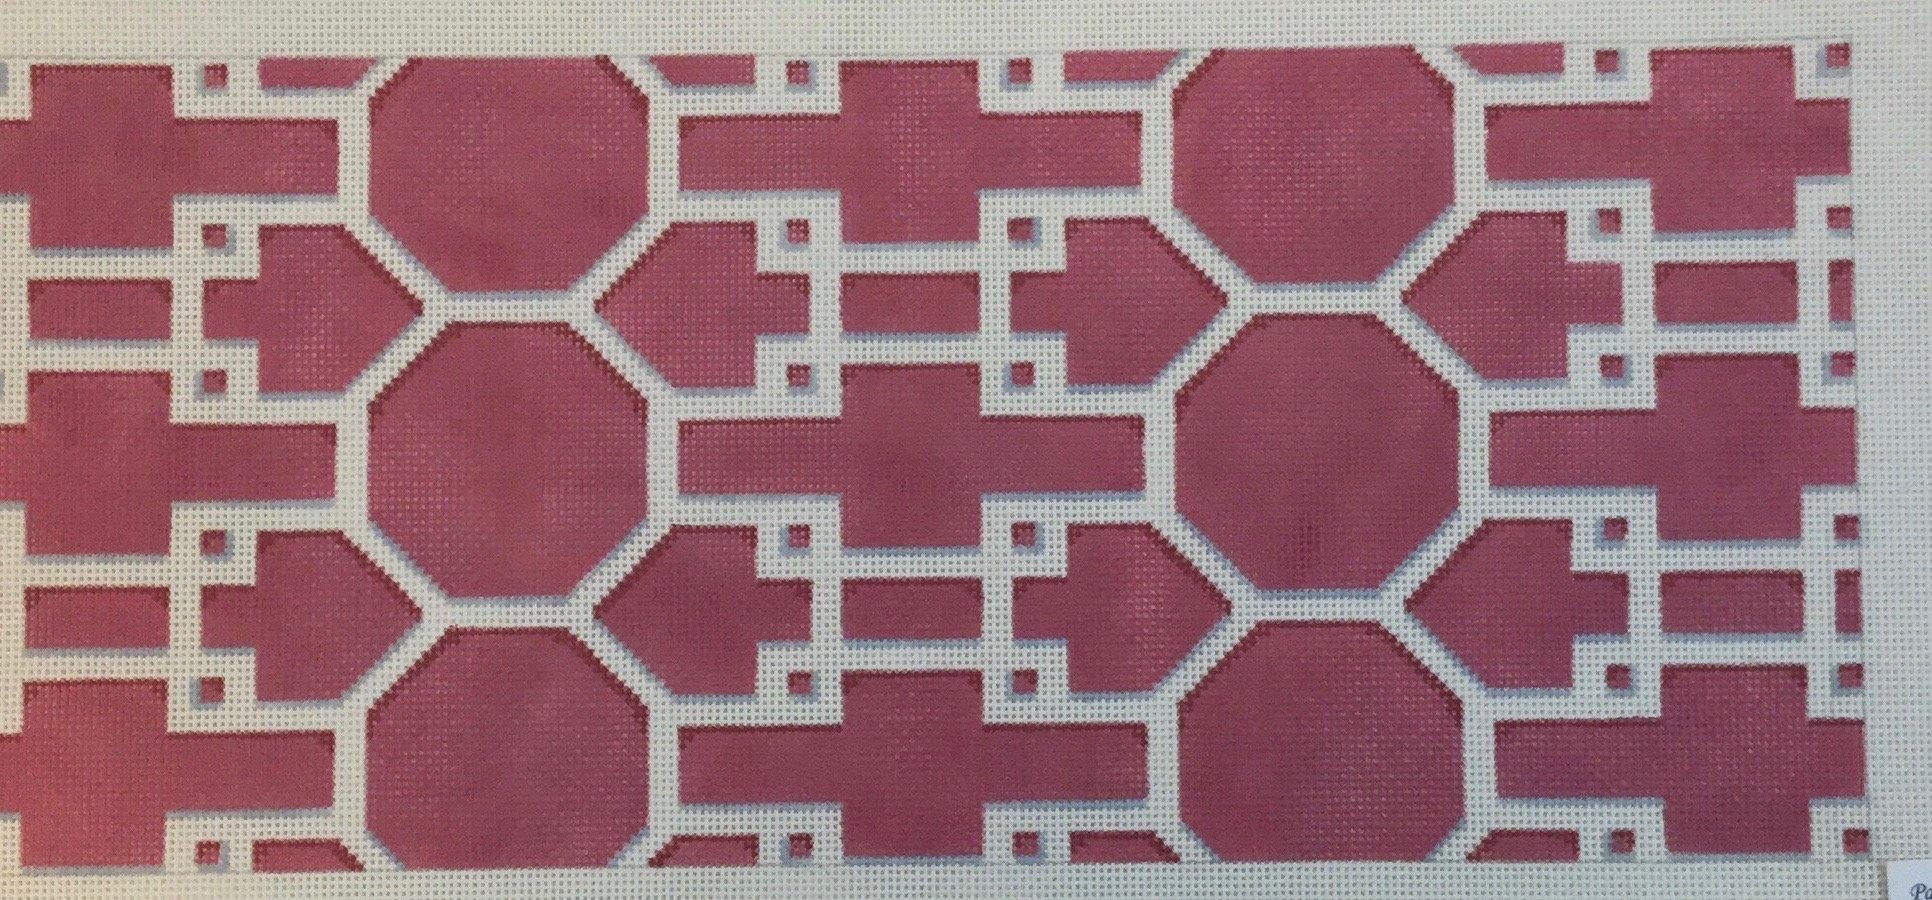 Geometric - Pink, 13 ct., 7.75 x 8